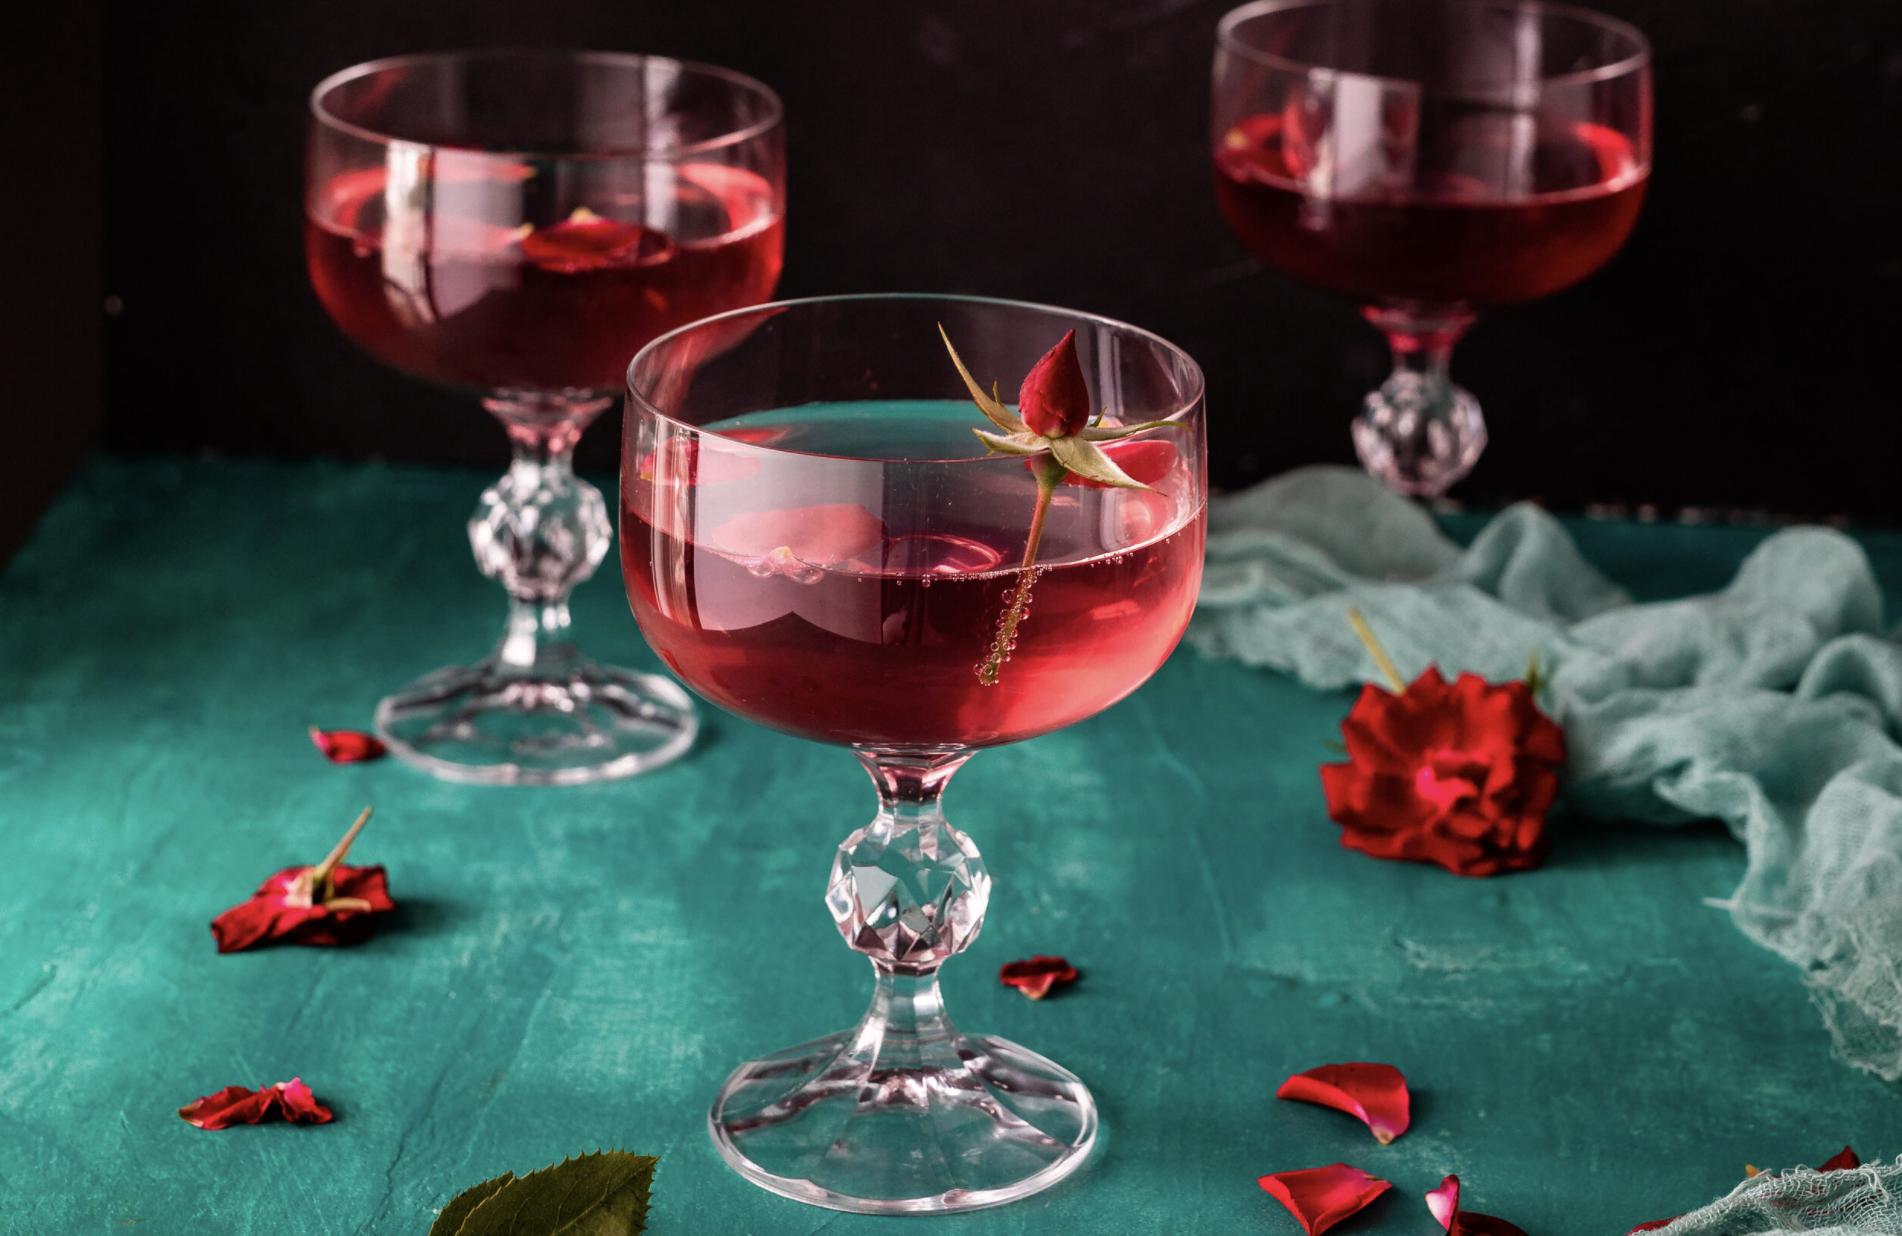 Rose Petals & Cardamom Syrup